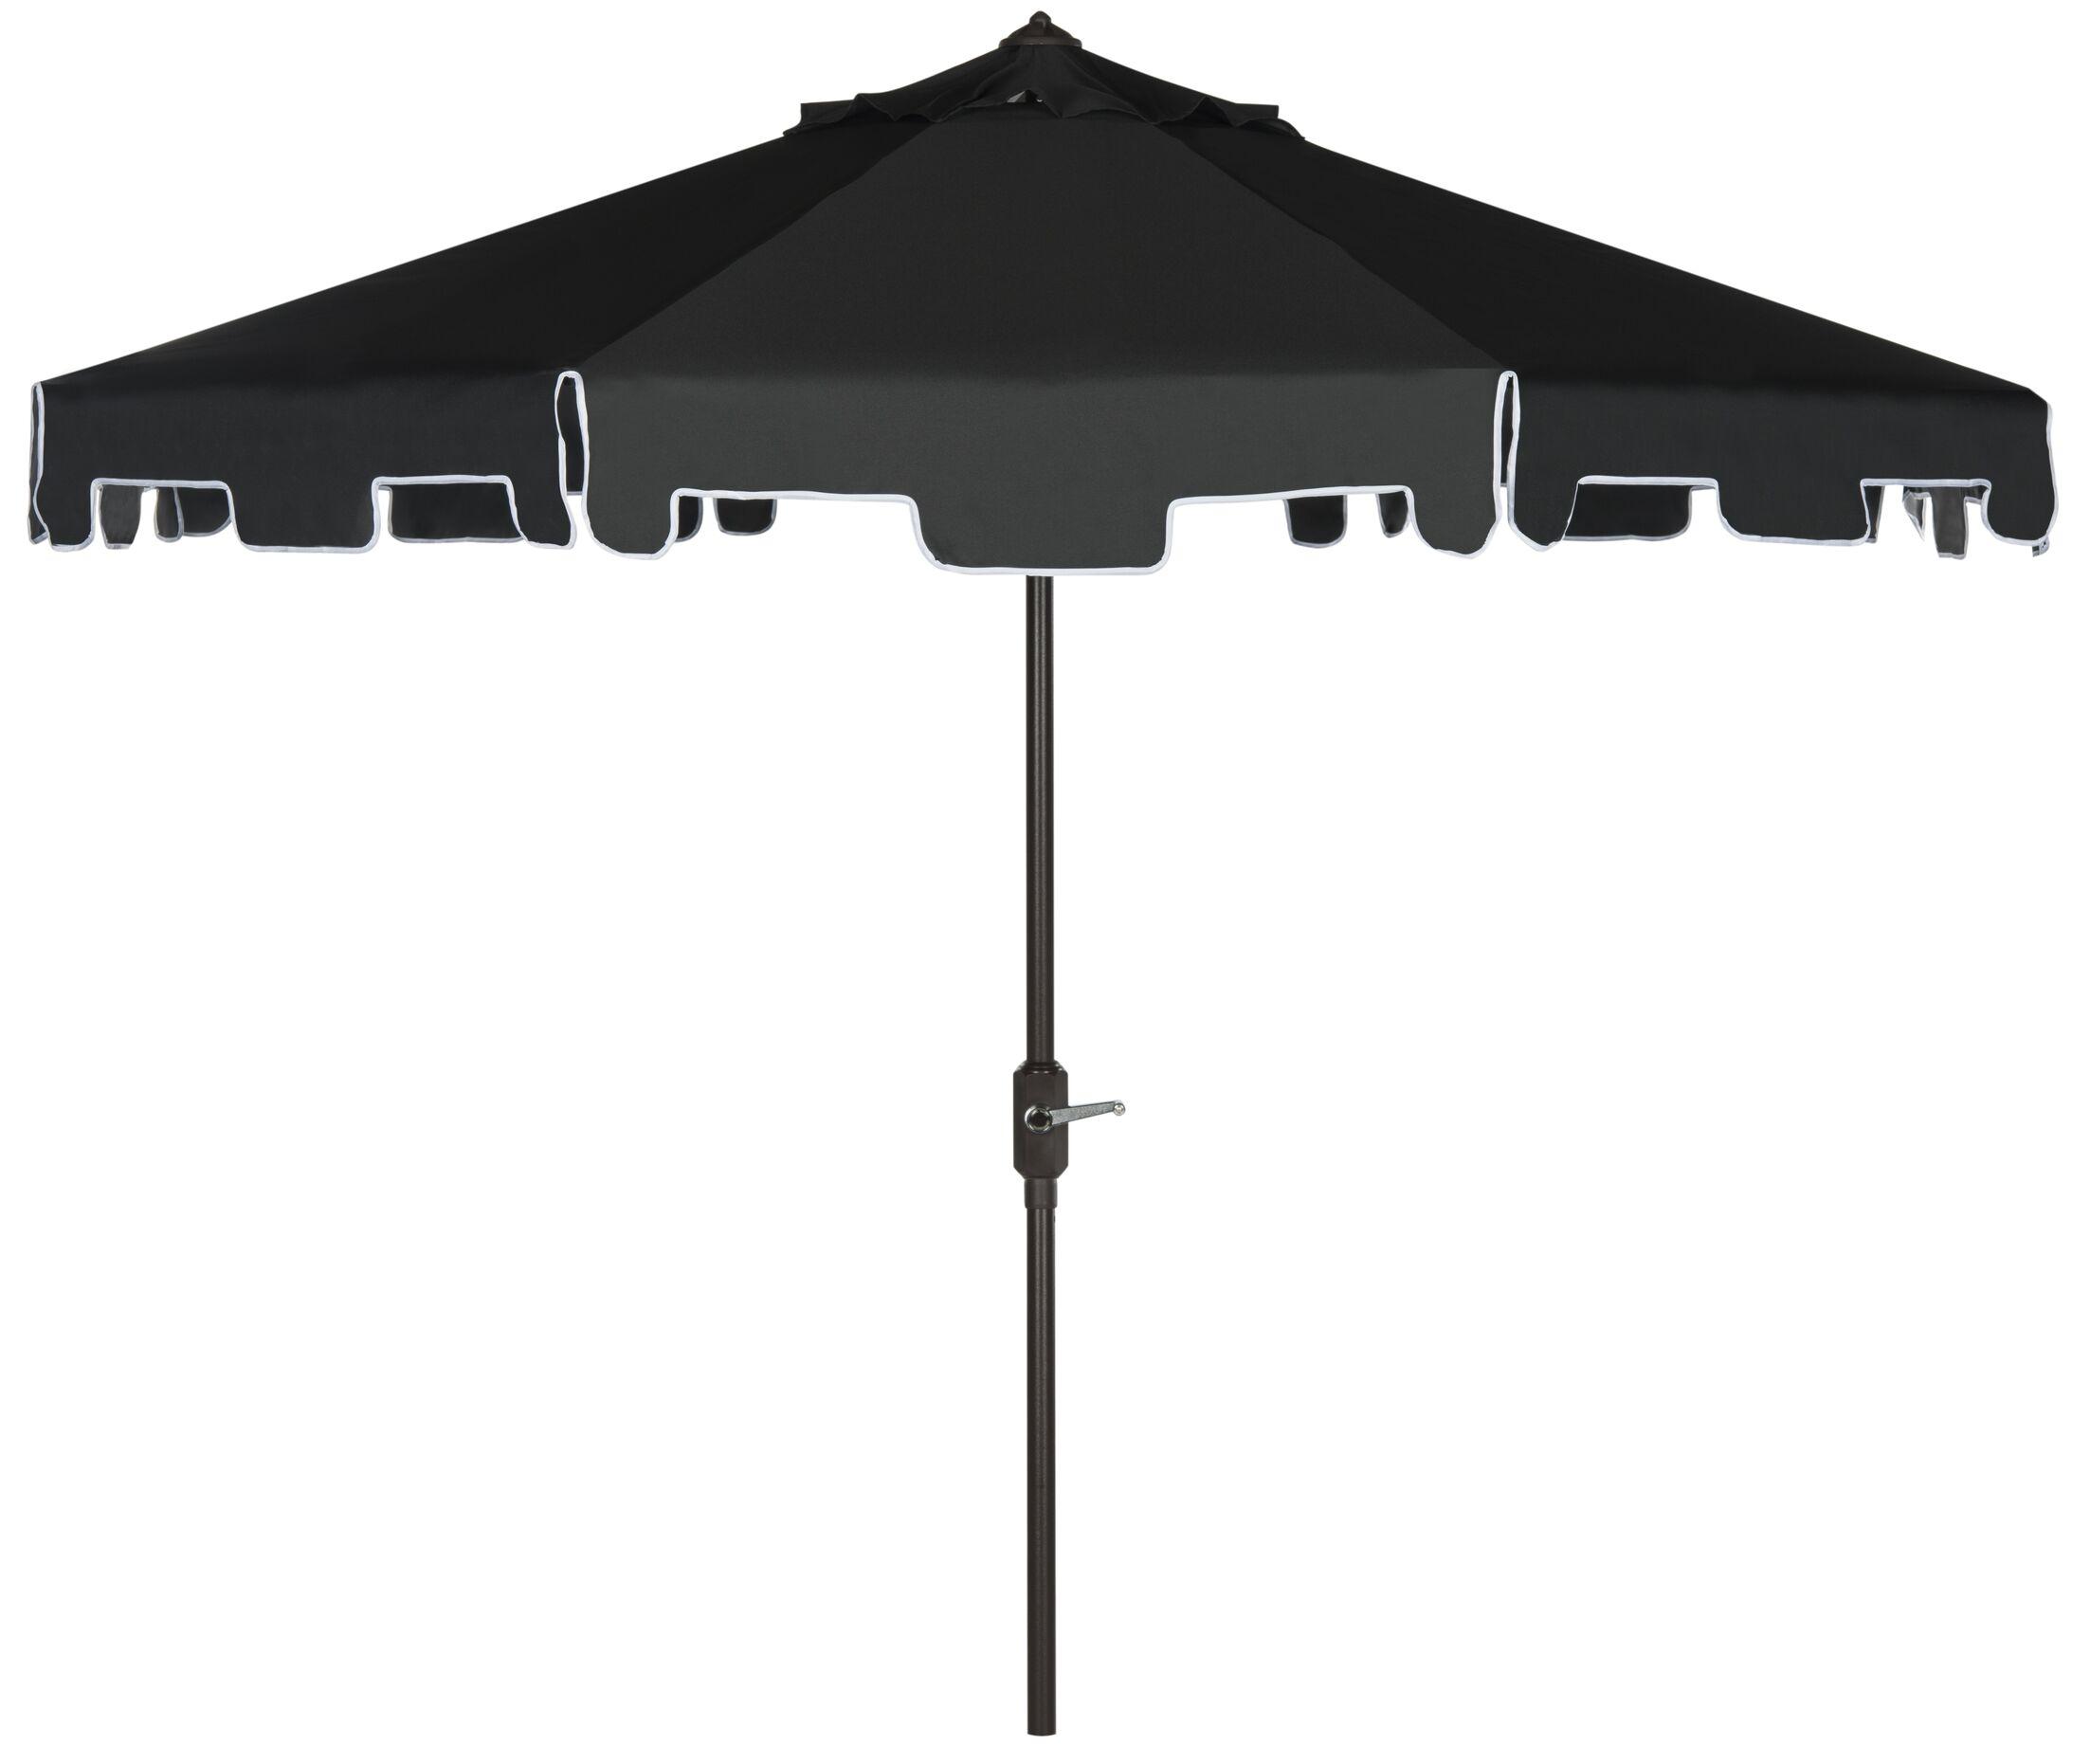 Holice 8' Drape Umbrella Fabric: Black